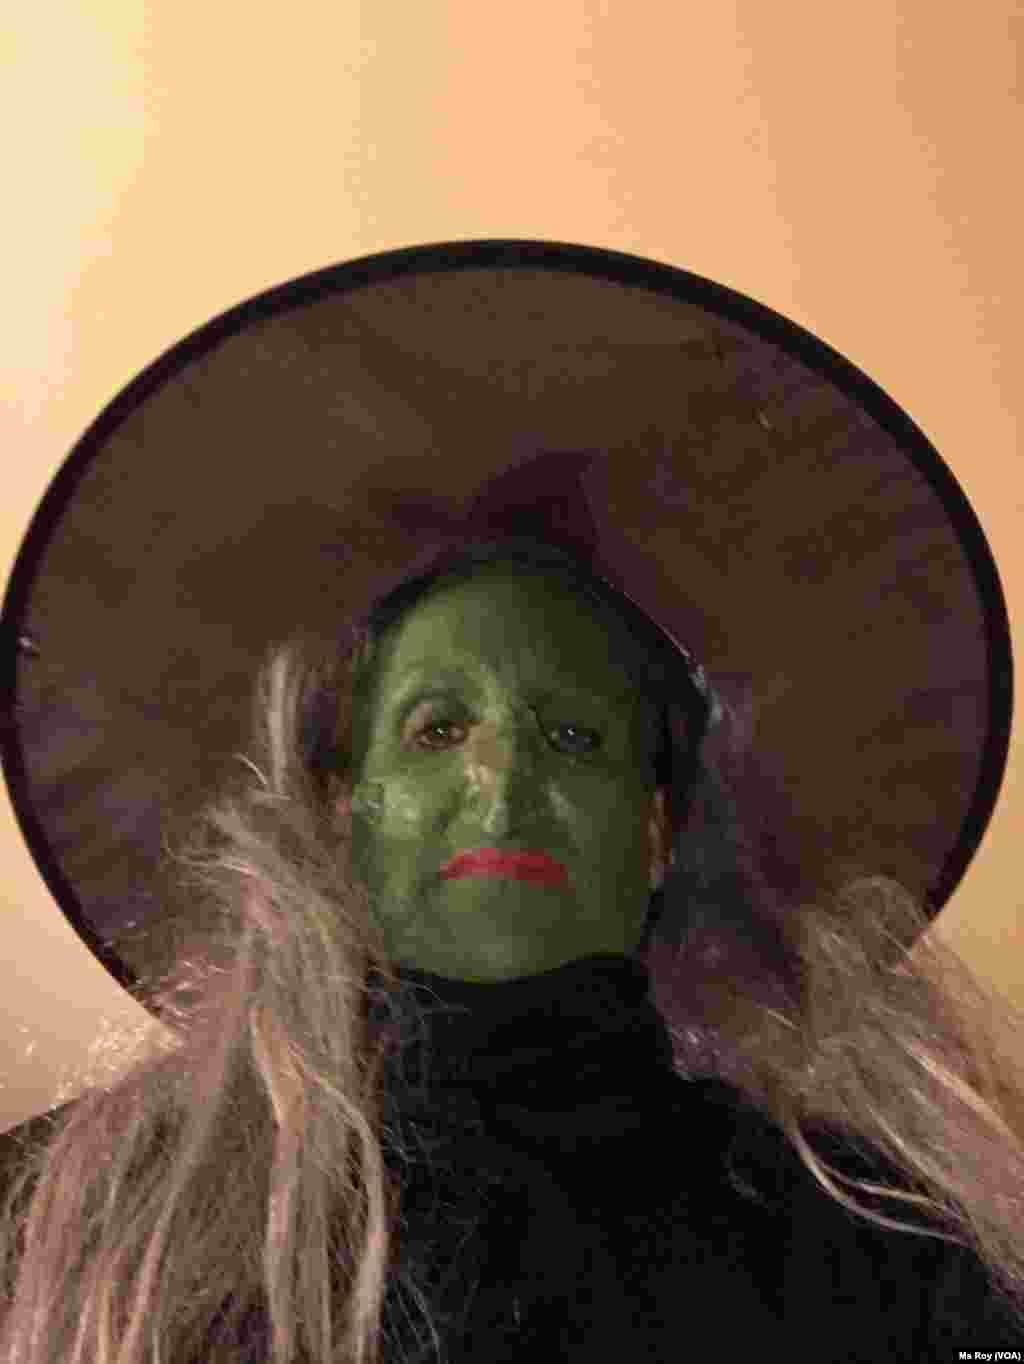 ShirinKrystin Roy a Ranar wasan Halloween, Gaithersburg, Maryland Ranar 31 Oktoba 2019.